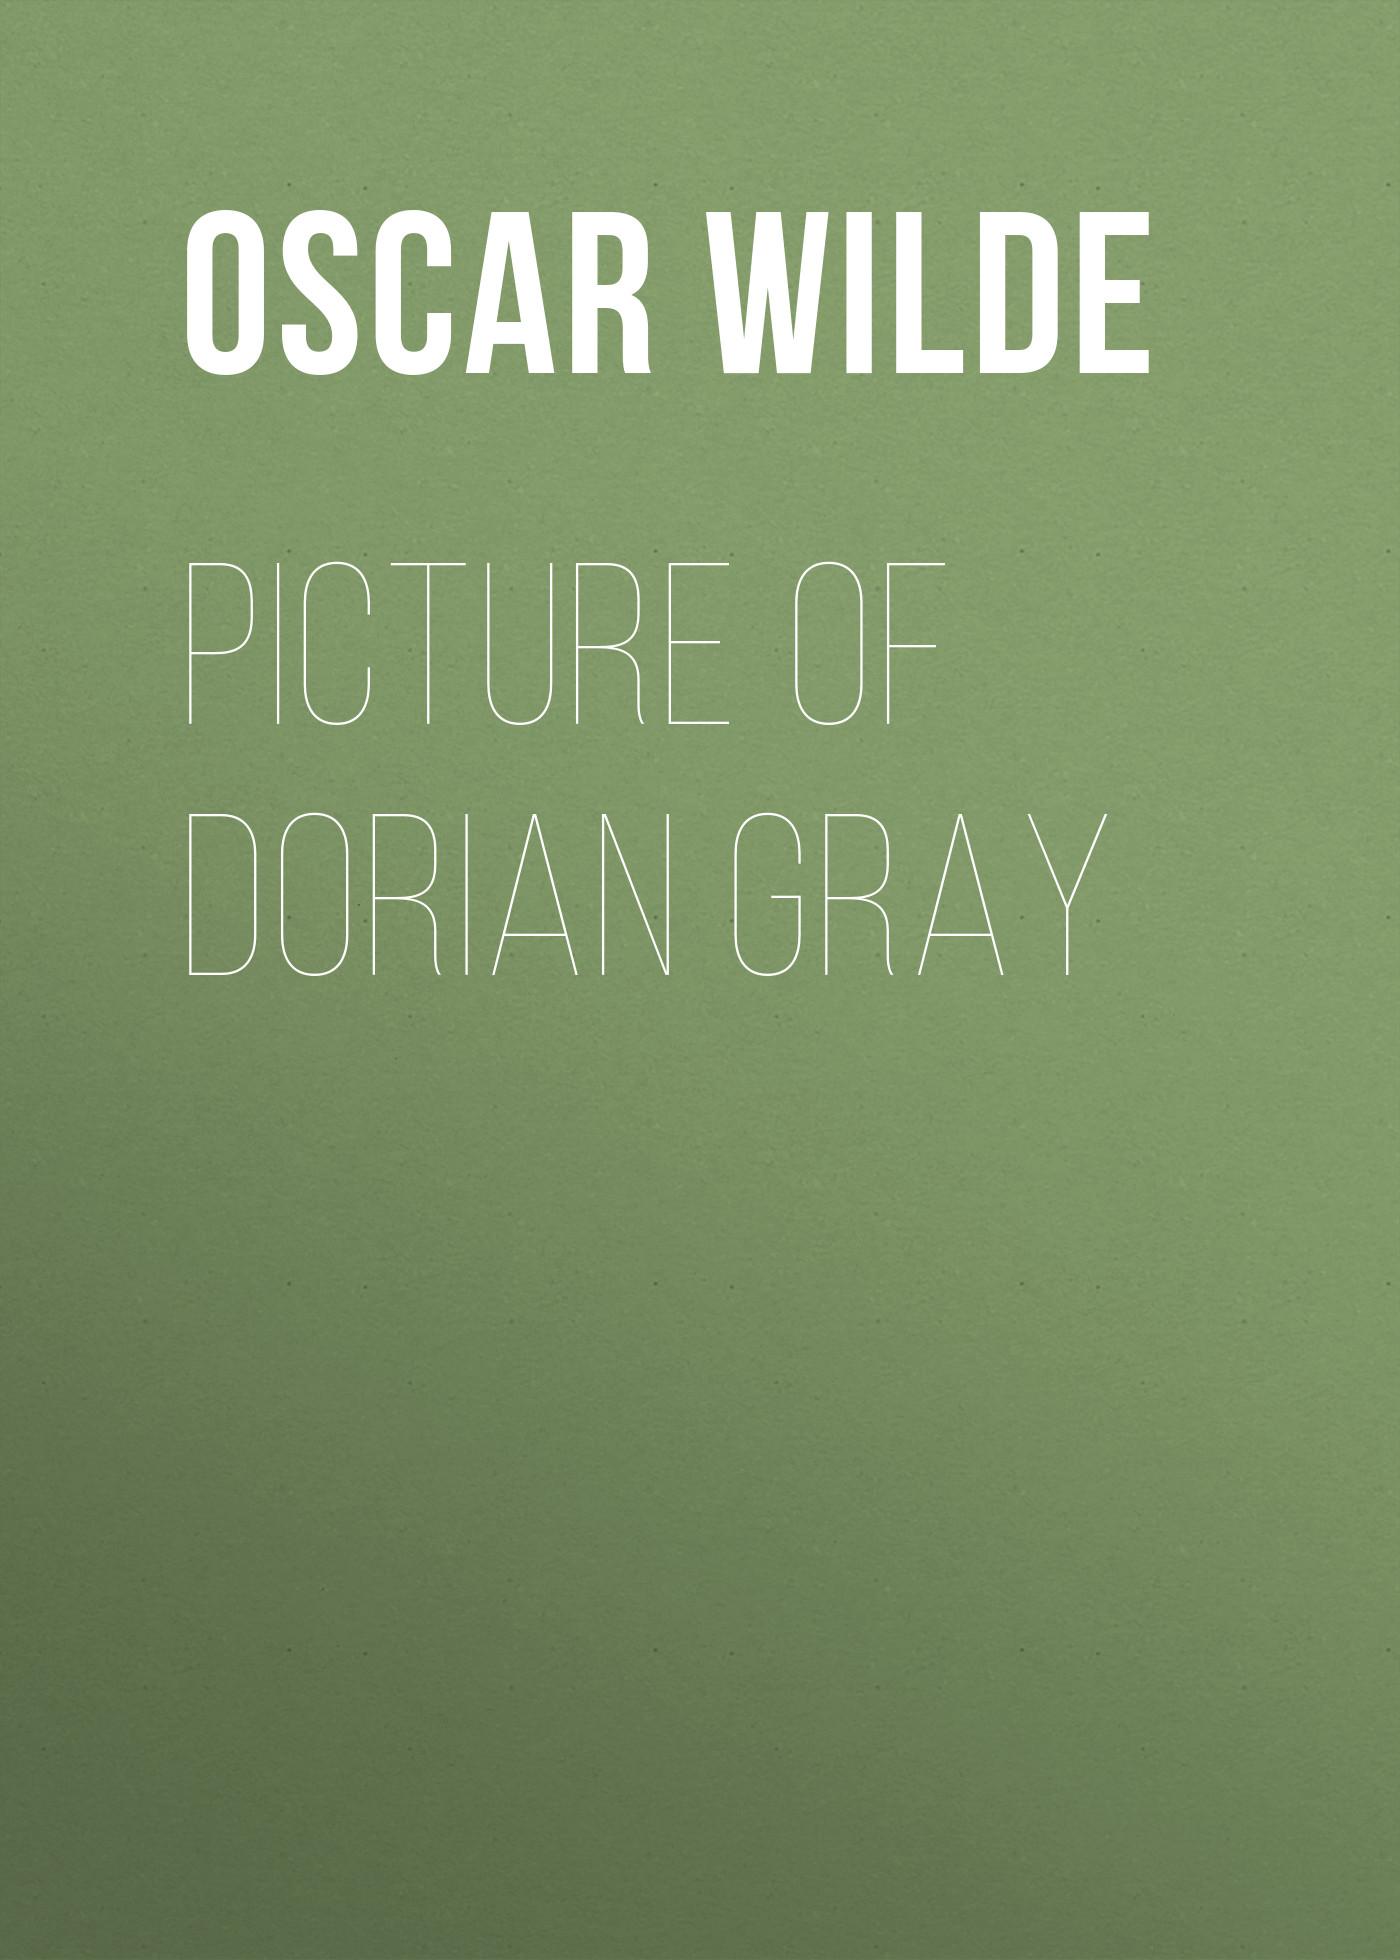 Oscar Wilde Picture of Dorian Gray wilde oscar the picture of dorian gray